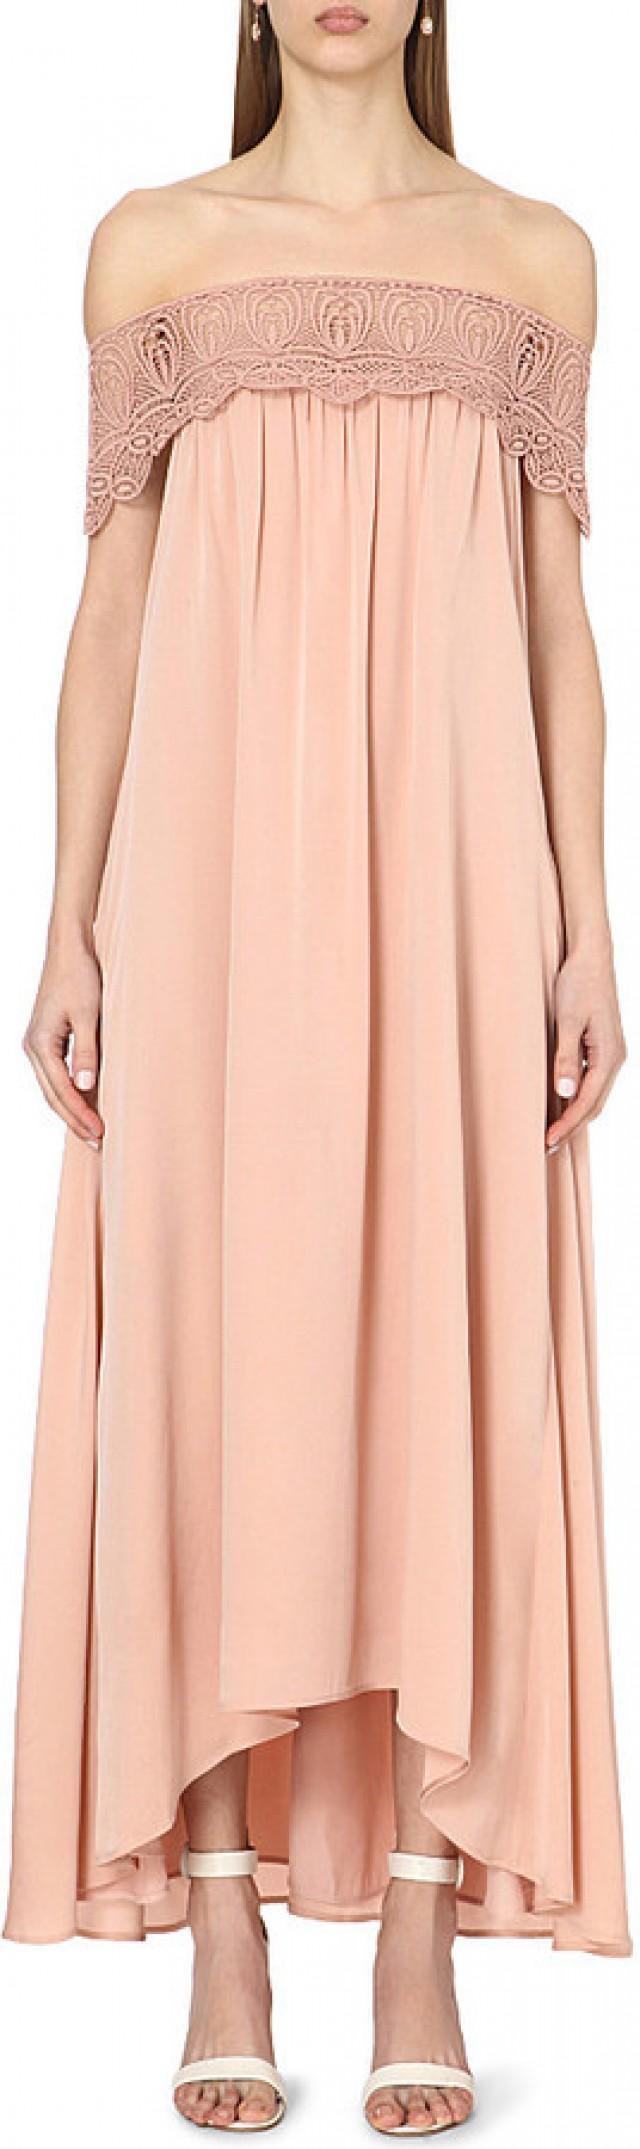 94b1777da6fd SELF-PORTRAIT Bardot Off-the-shoulder Bridesmaid Dress #2527568 - Weddbook